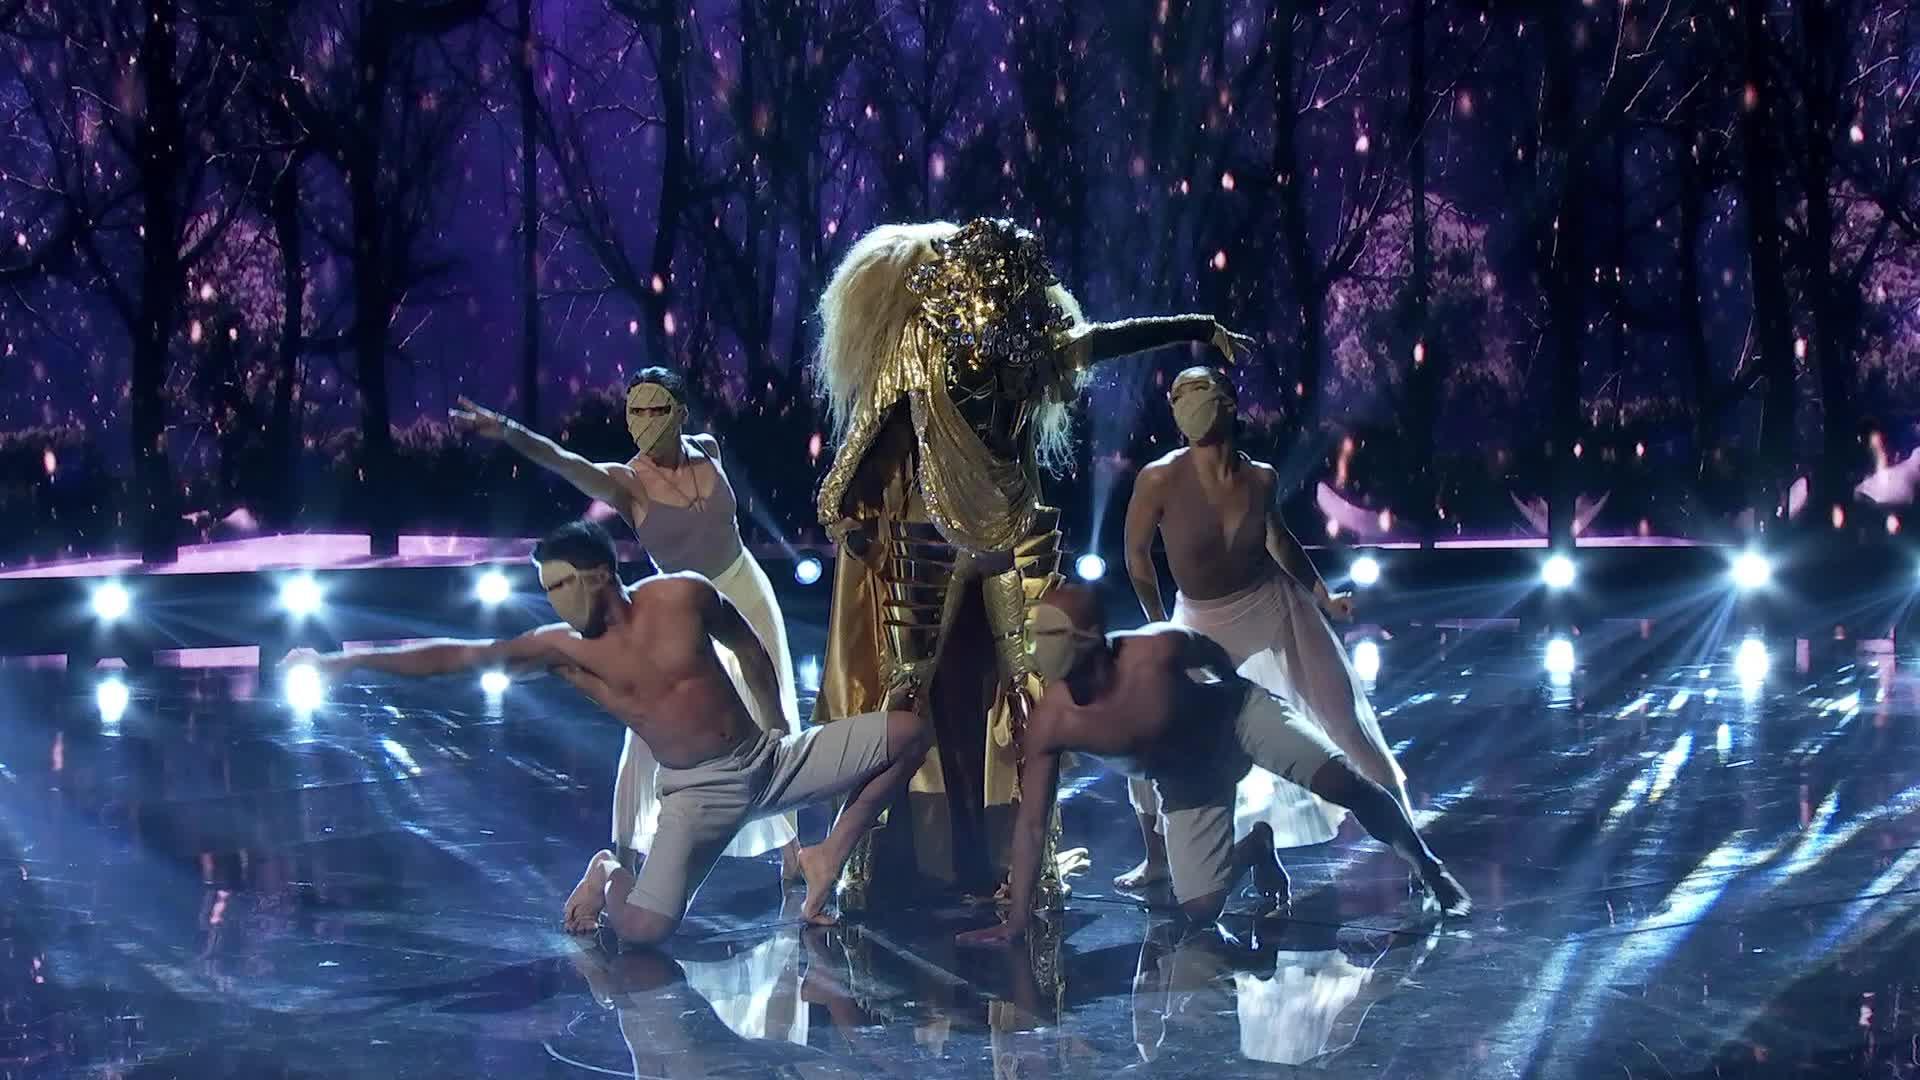 dance, fabulous, lion, magic, magical, masked singer, party, the masked singer, the masked singer on fox, Lion Performing GIFs